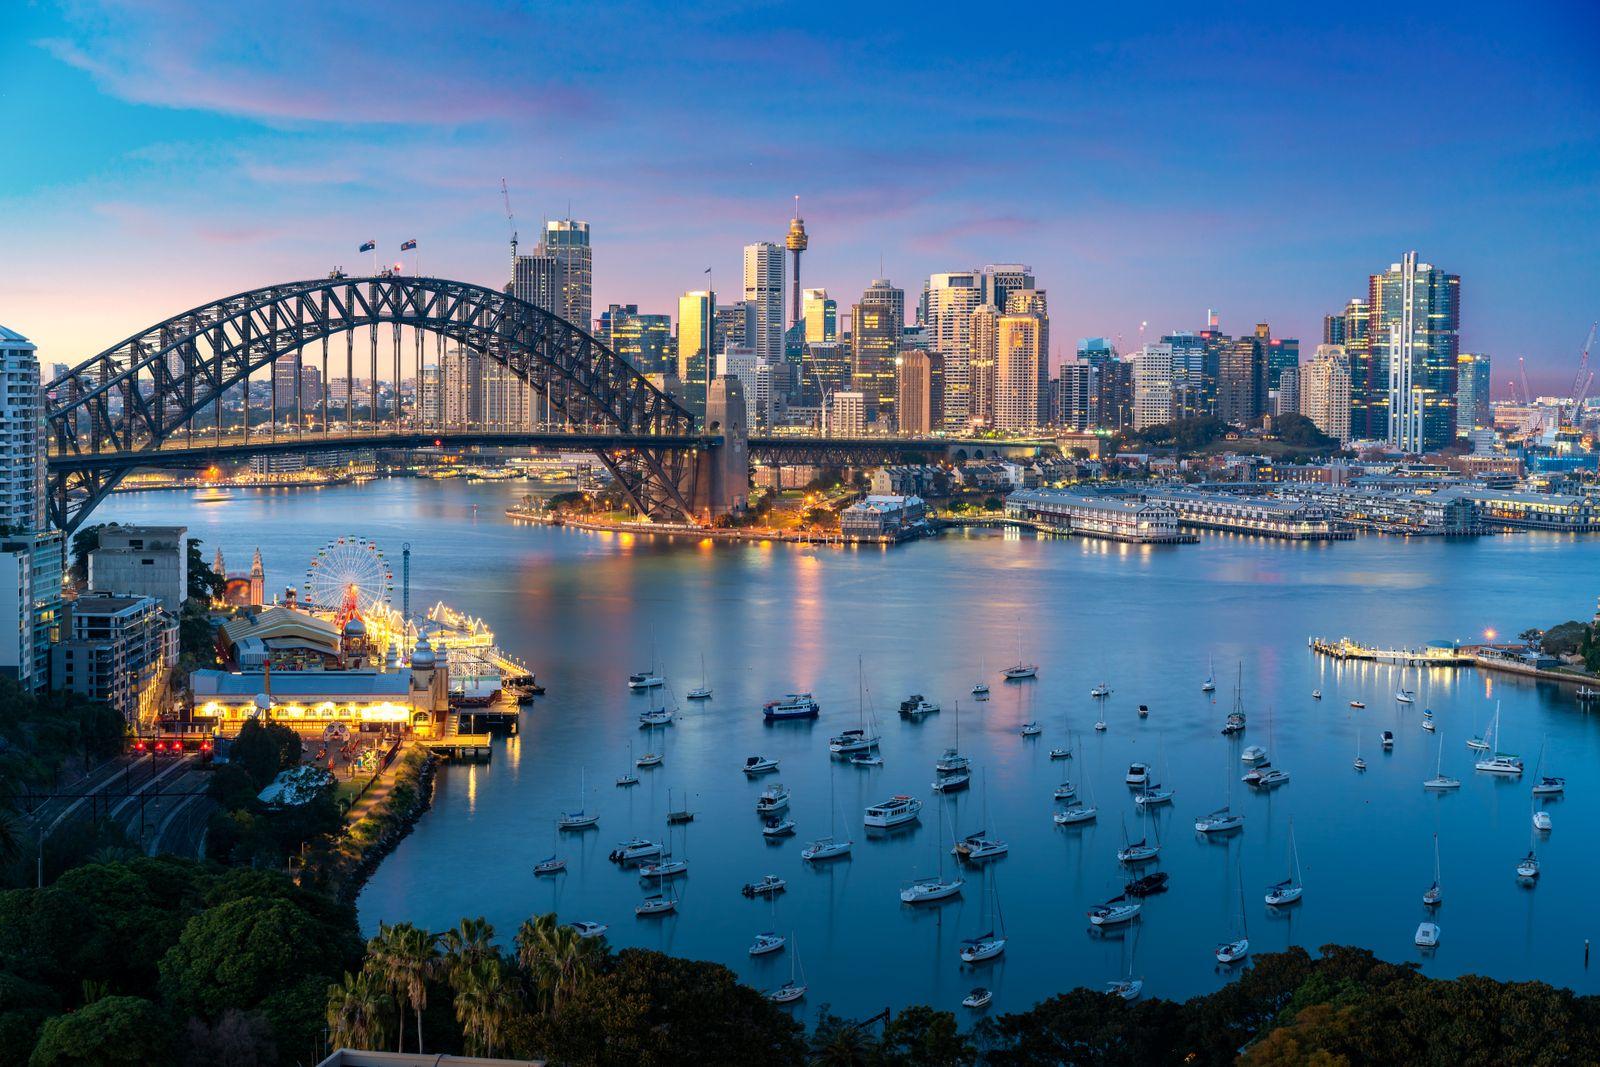 Cityscape image of Sydney, Australia with Harbor Bridge and Sydney skyline during sunset. Vacation and travel in Australia.